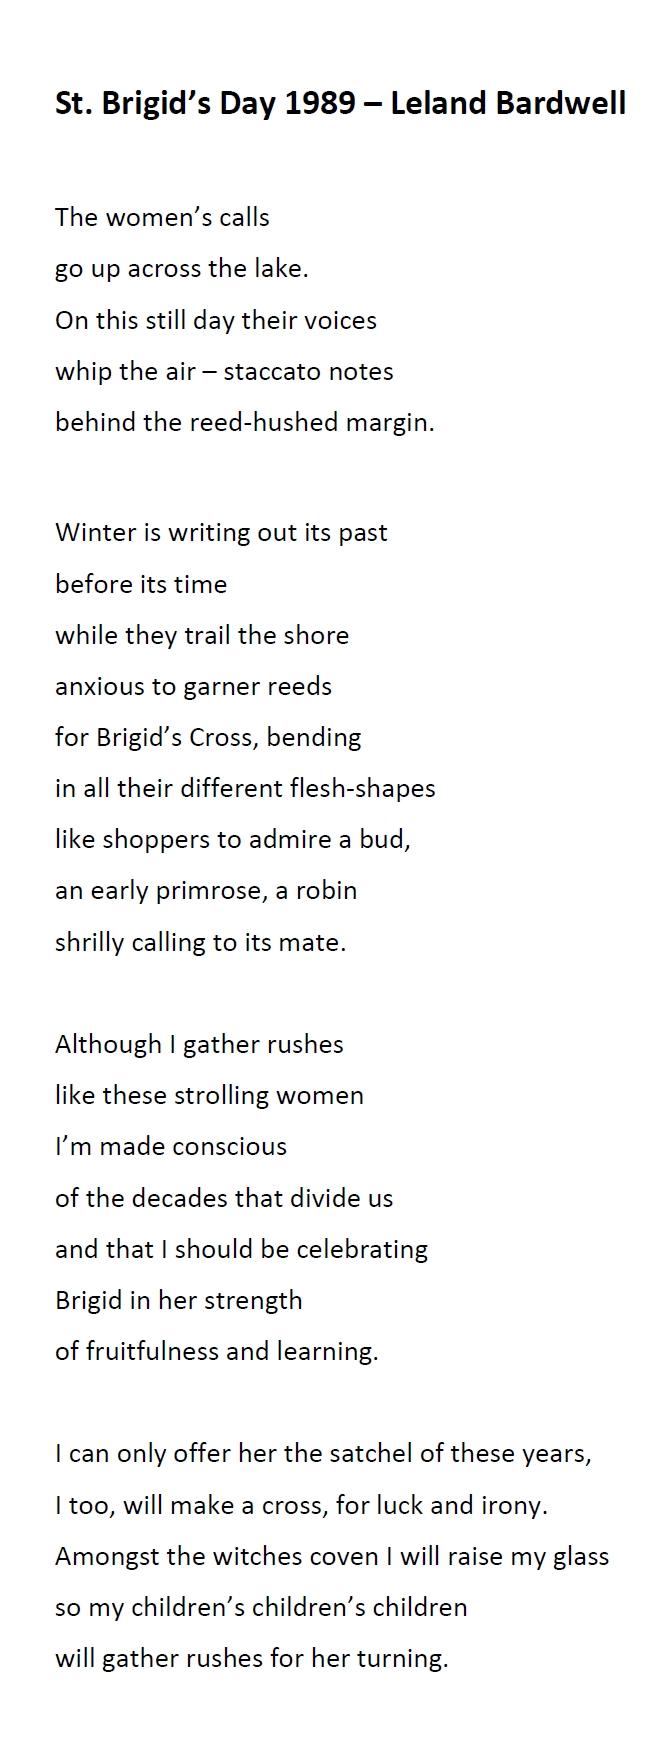 SBD1989 poem.jpg